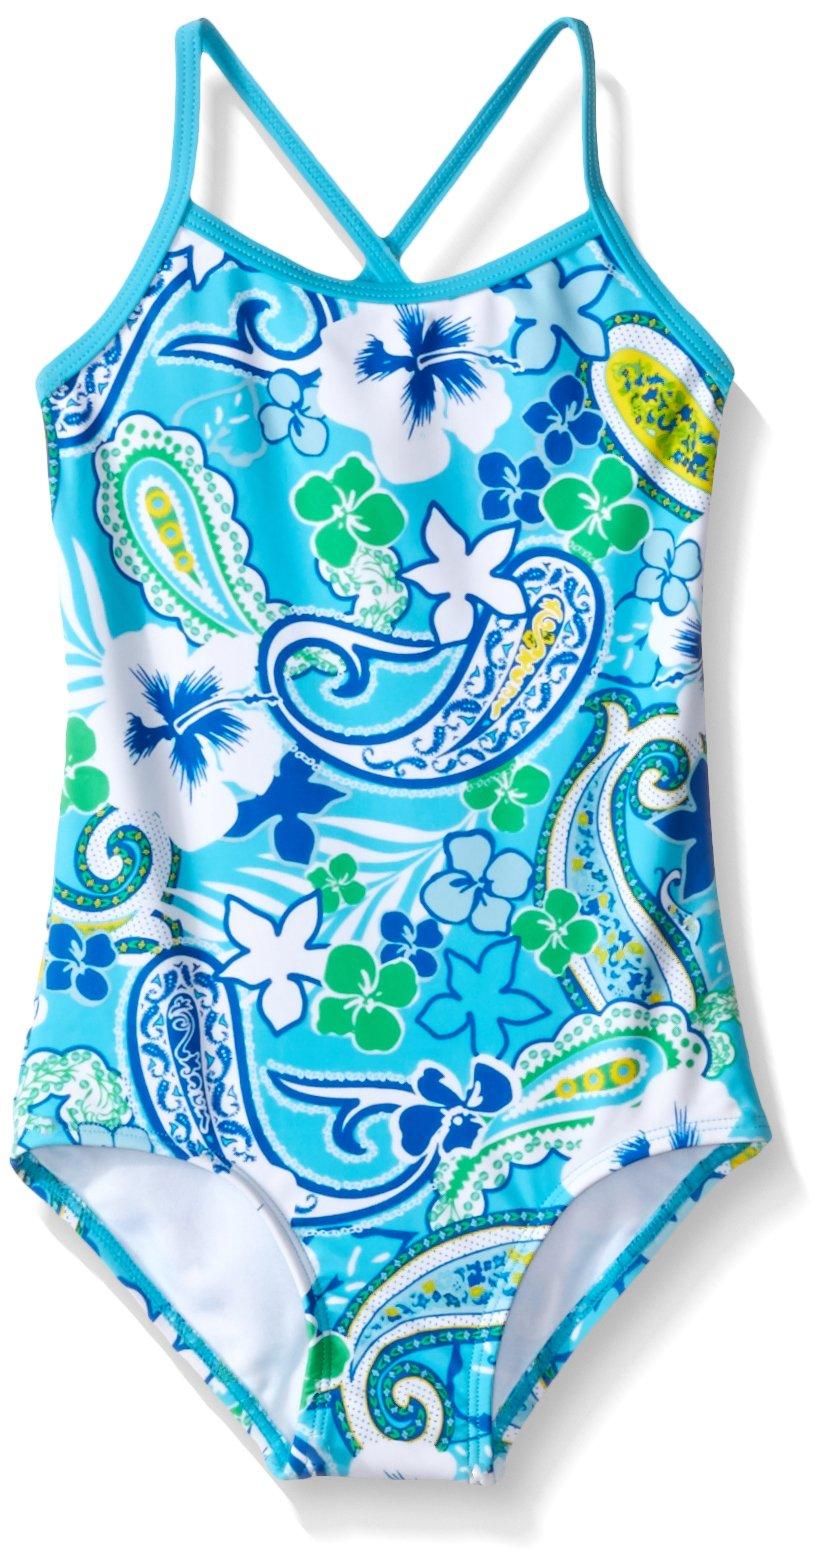 Kanu Surf Big Girls Summer Dream One Piece Swimsuit, Blue, 10